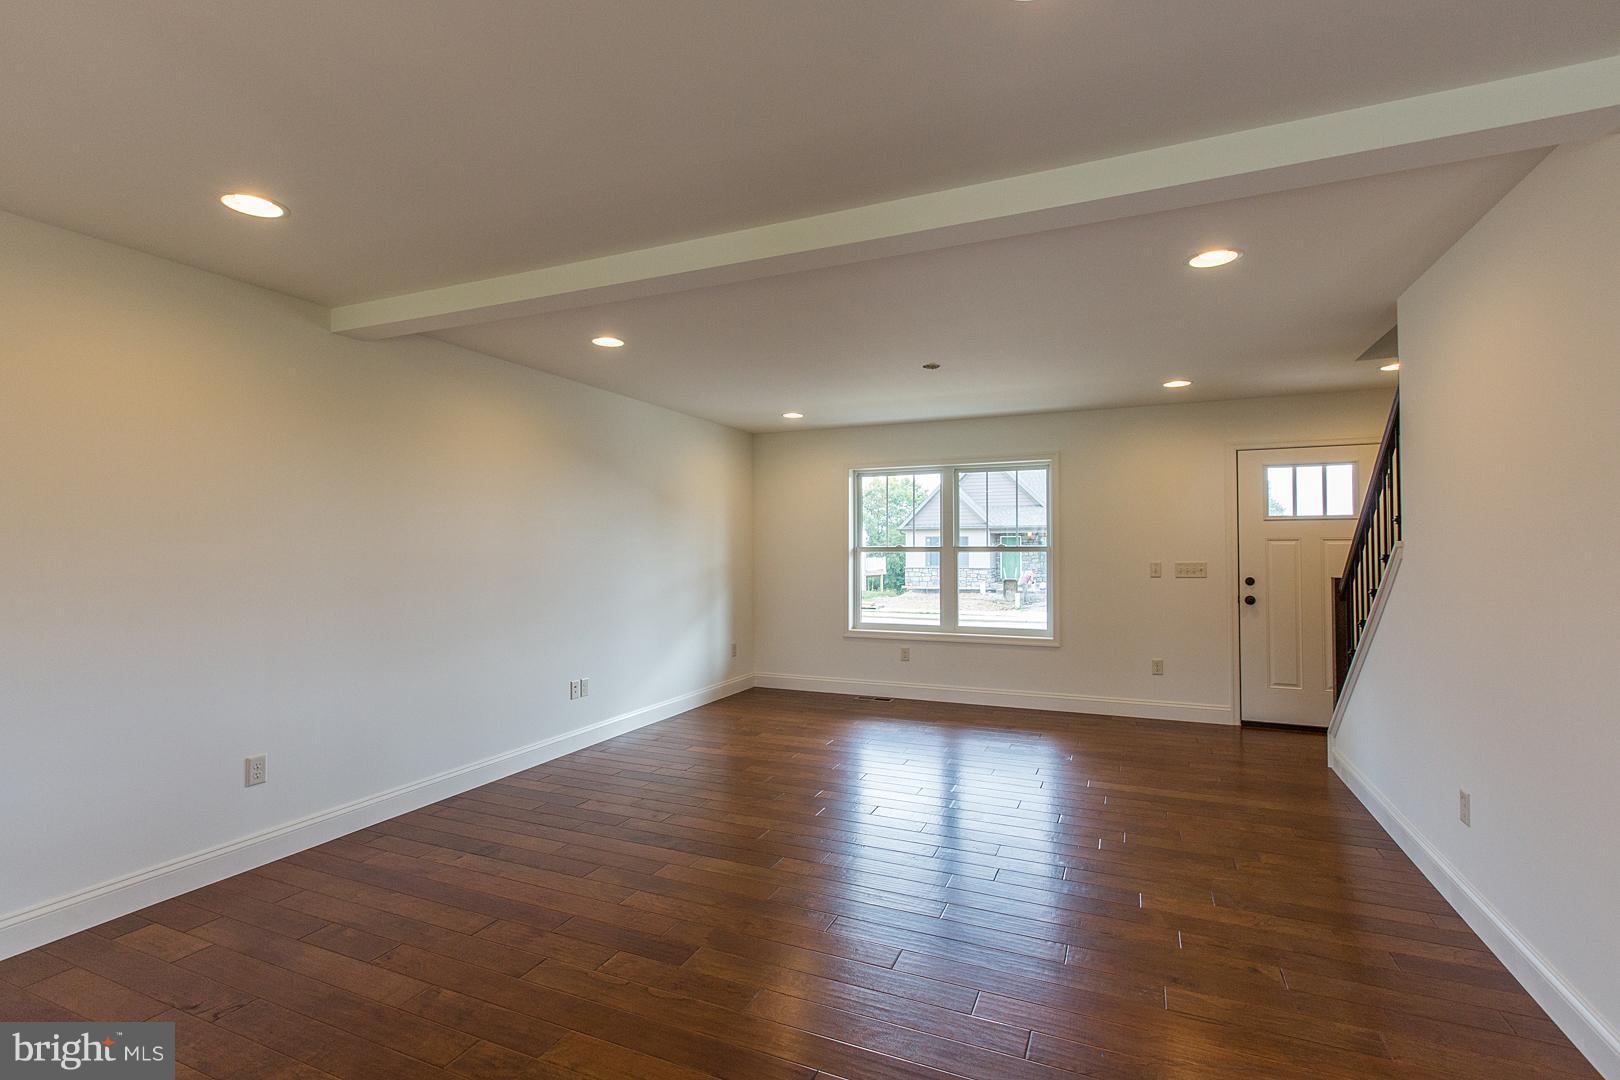 Example of Similar Home - Not an exact Replica